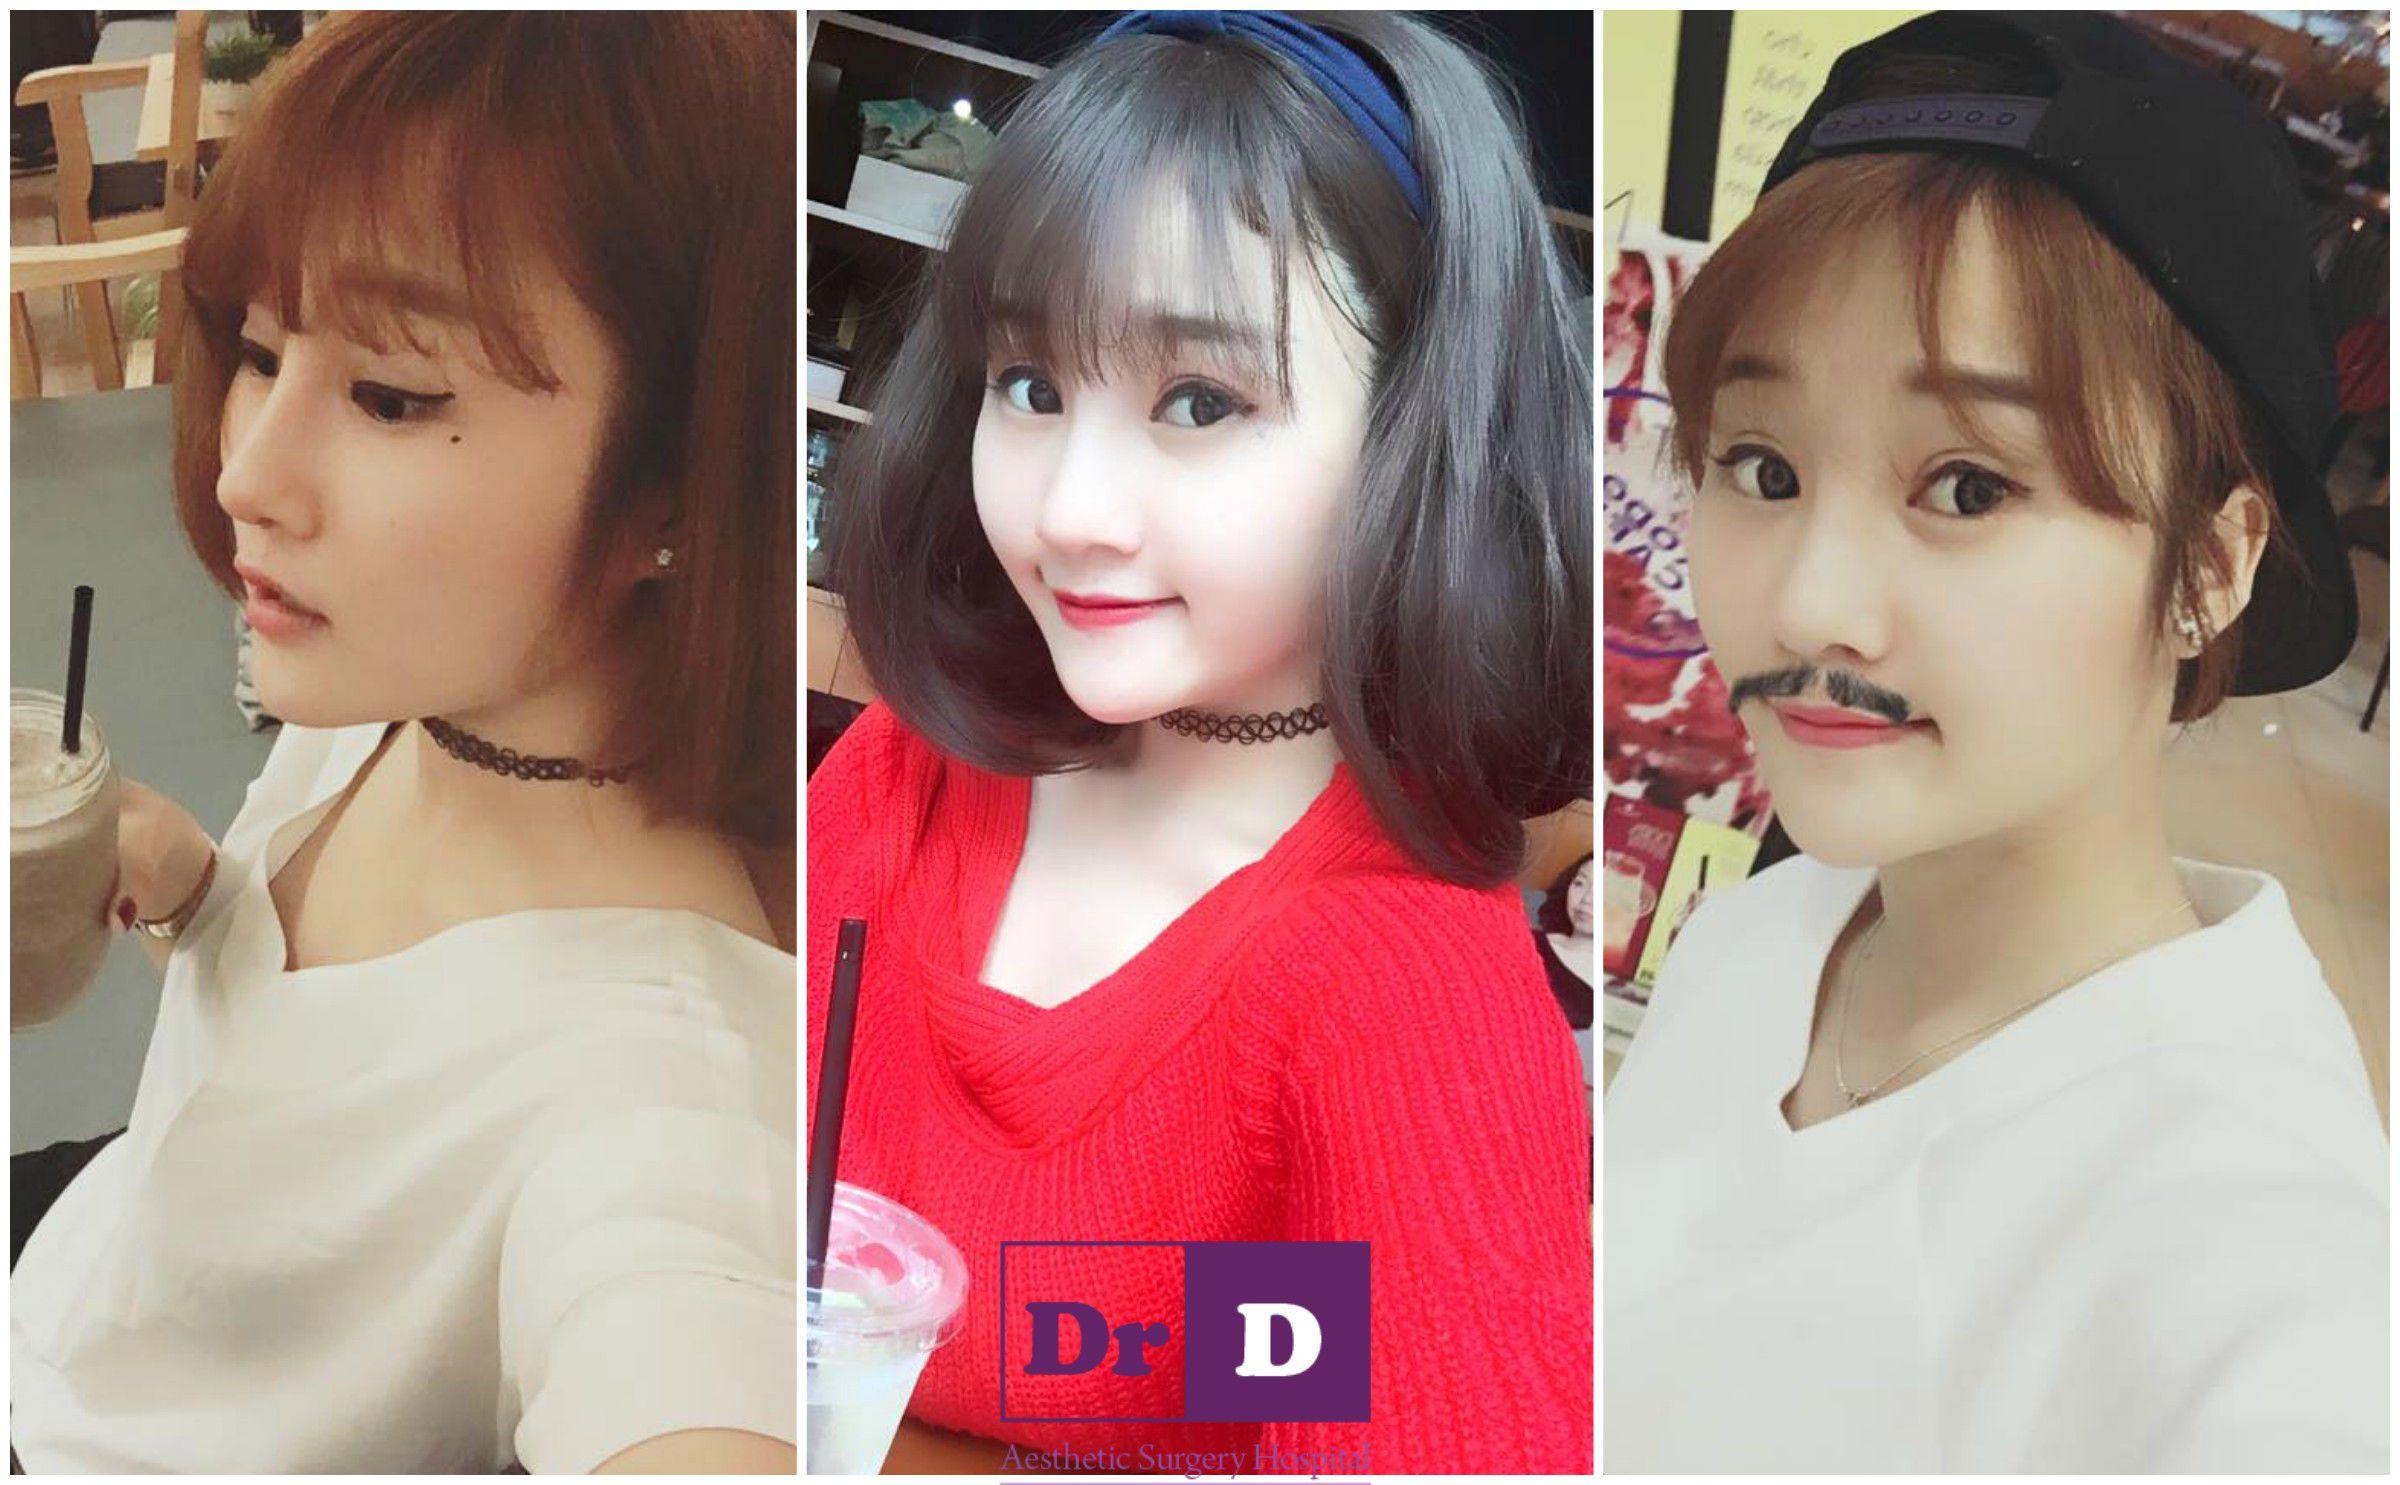 dep-cho-nang-tre-sang-cho-me-uu-dai-lon-cho-83 (3)